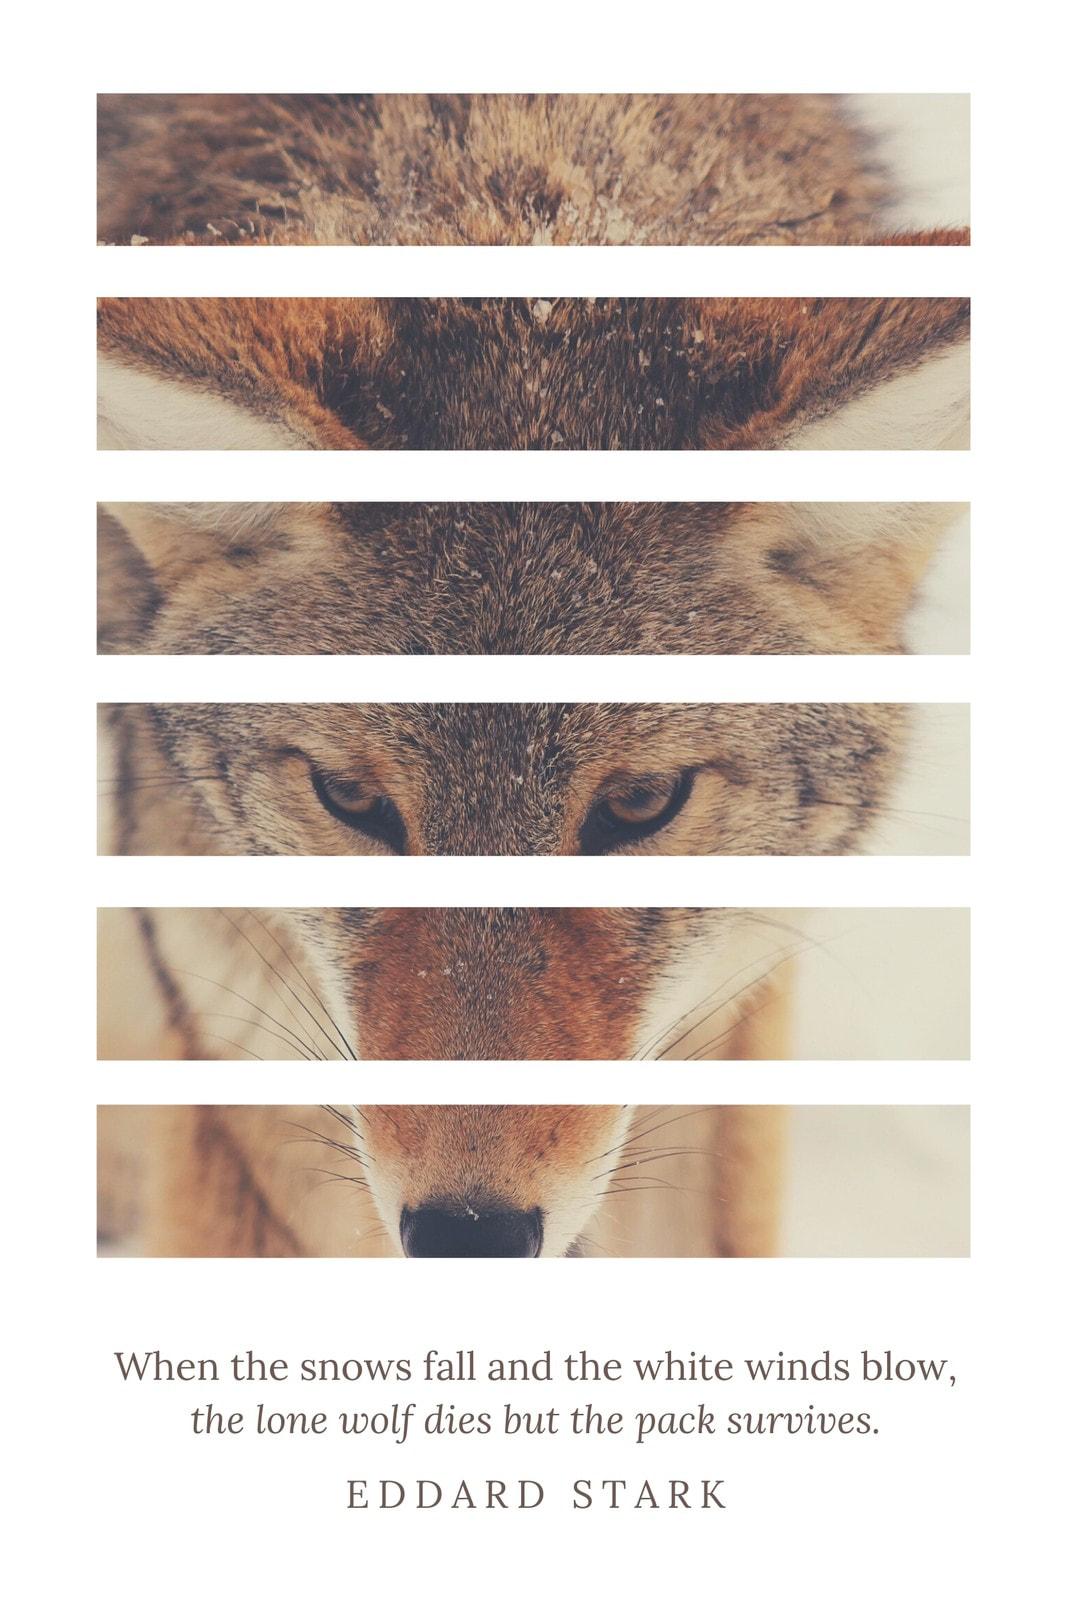 Wolf Eddard Stark Quote Tumblr Graphic